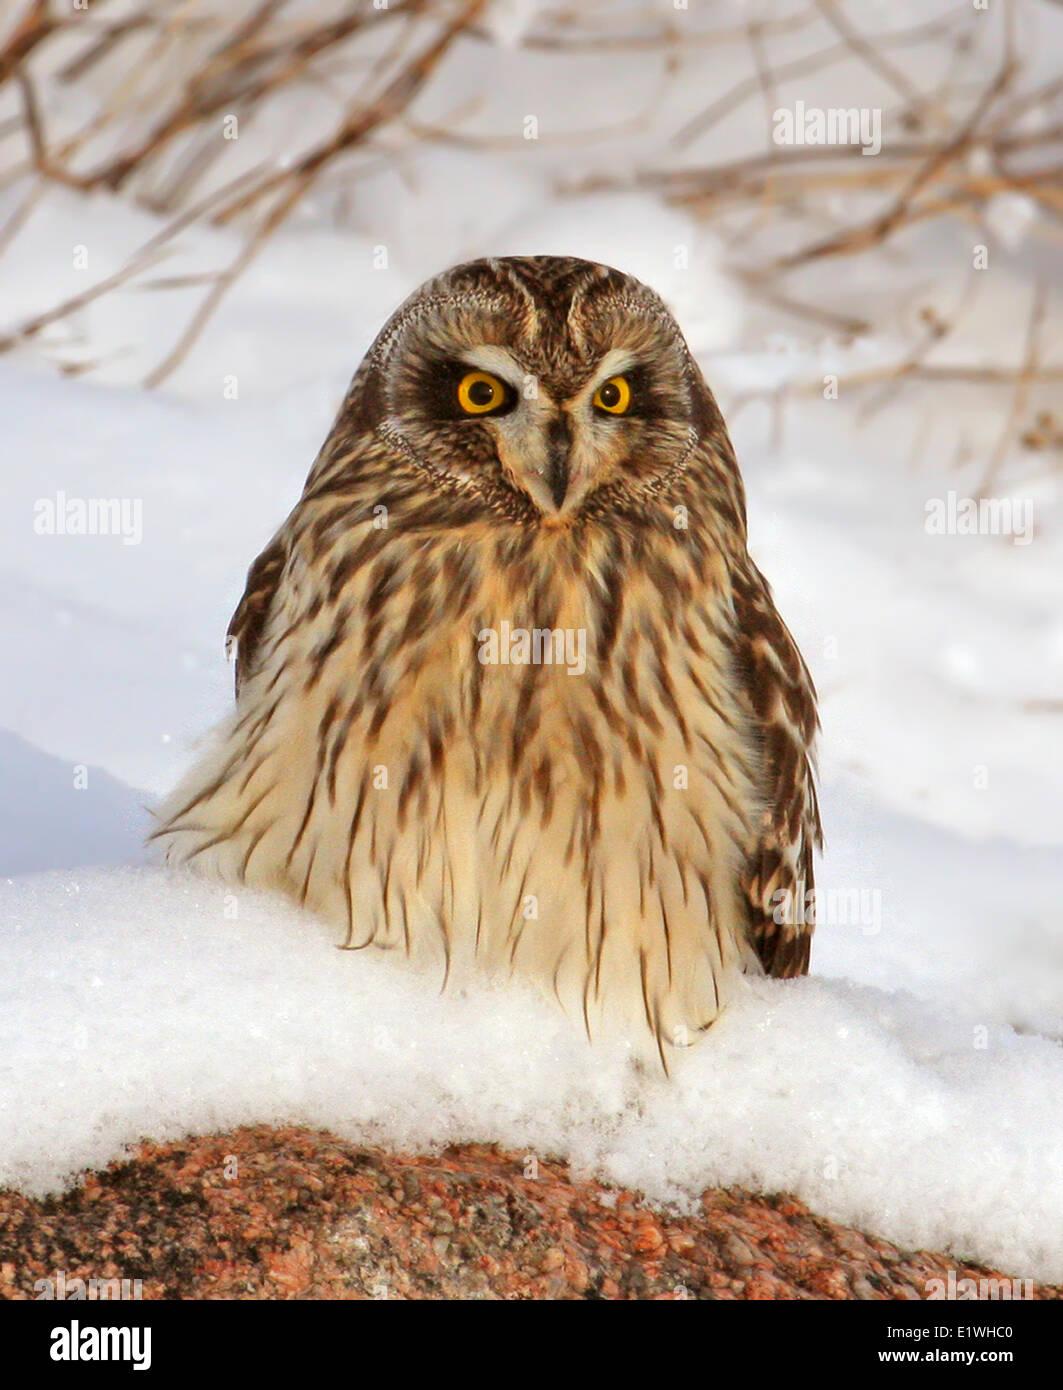 A Short-eared Owl, Asio flammeus,  sat in the snow, at Gardiner Dam, Saskatchewan - Stock Image